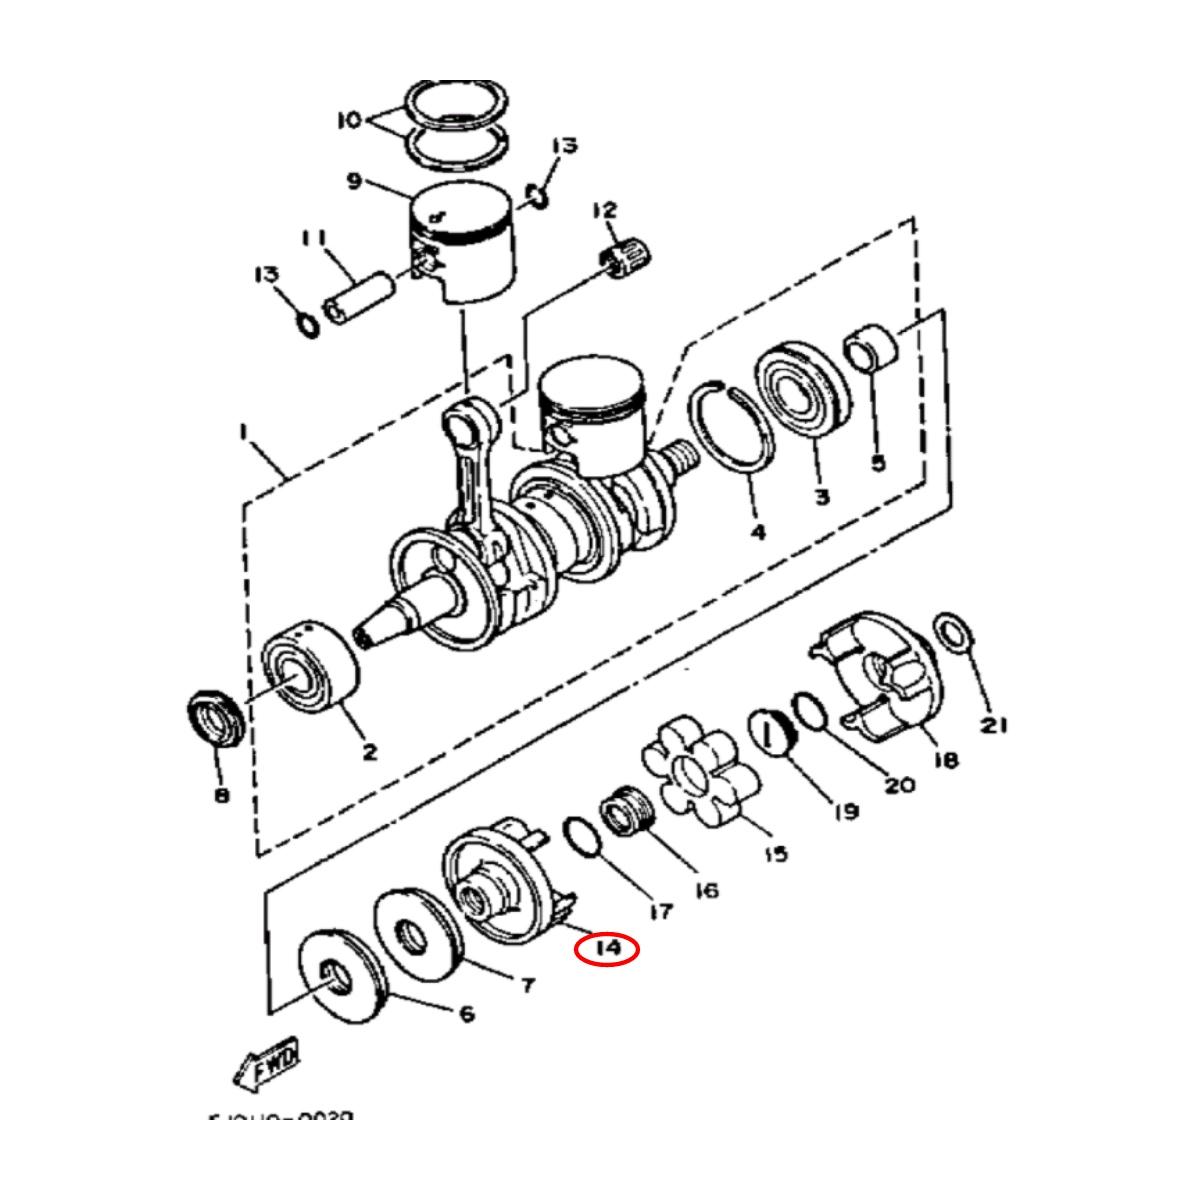 Acoplador para Jet Ski Yamaha GP 1200 Motor 24mm 5D  - Radical Peças - Peças para Jet Ski